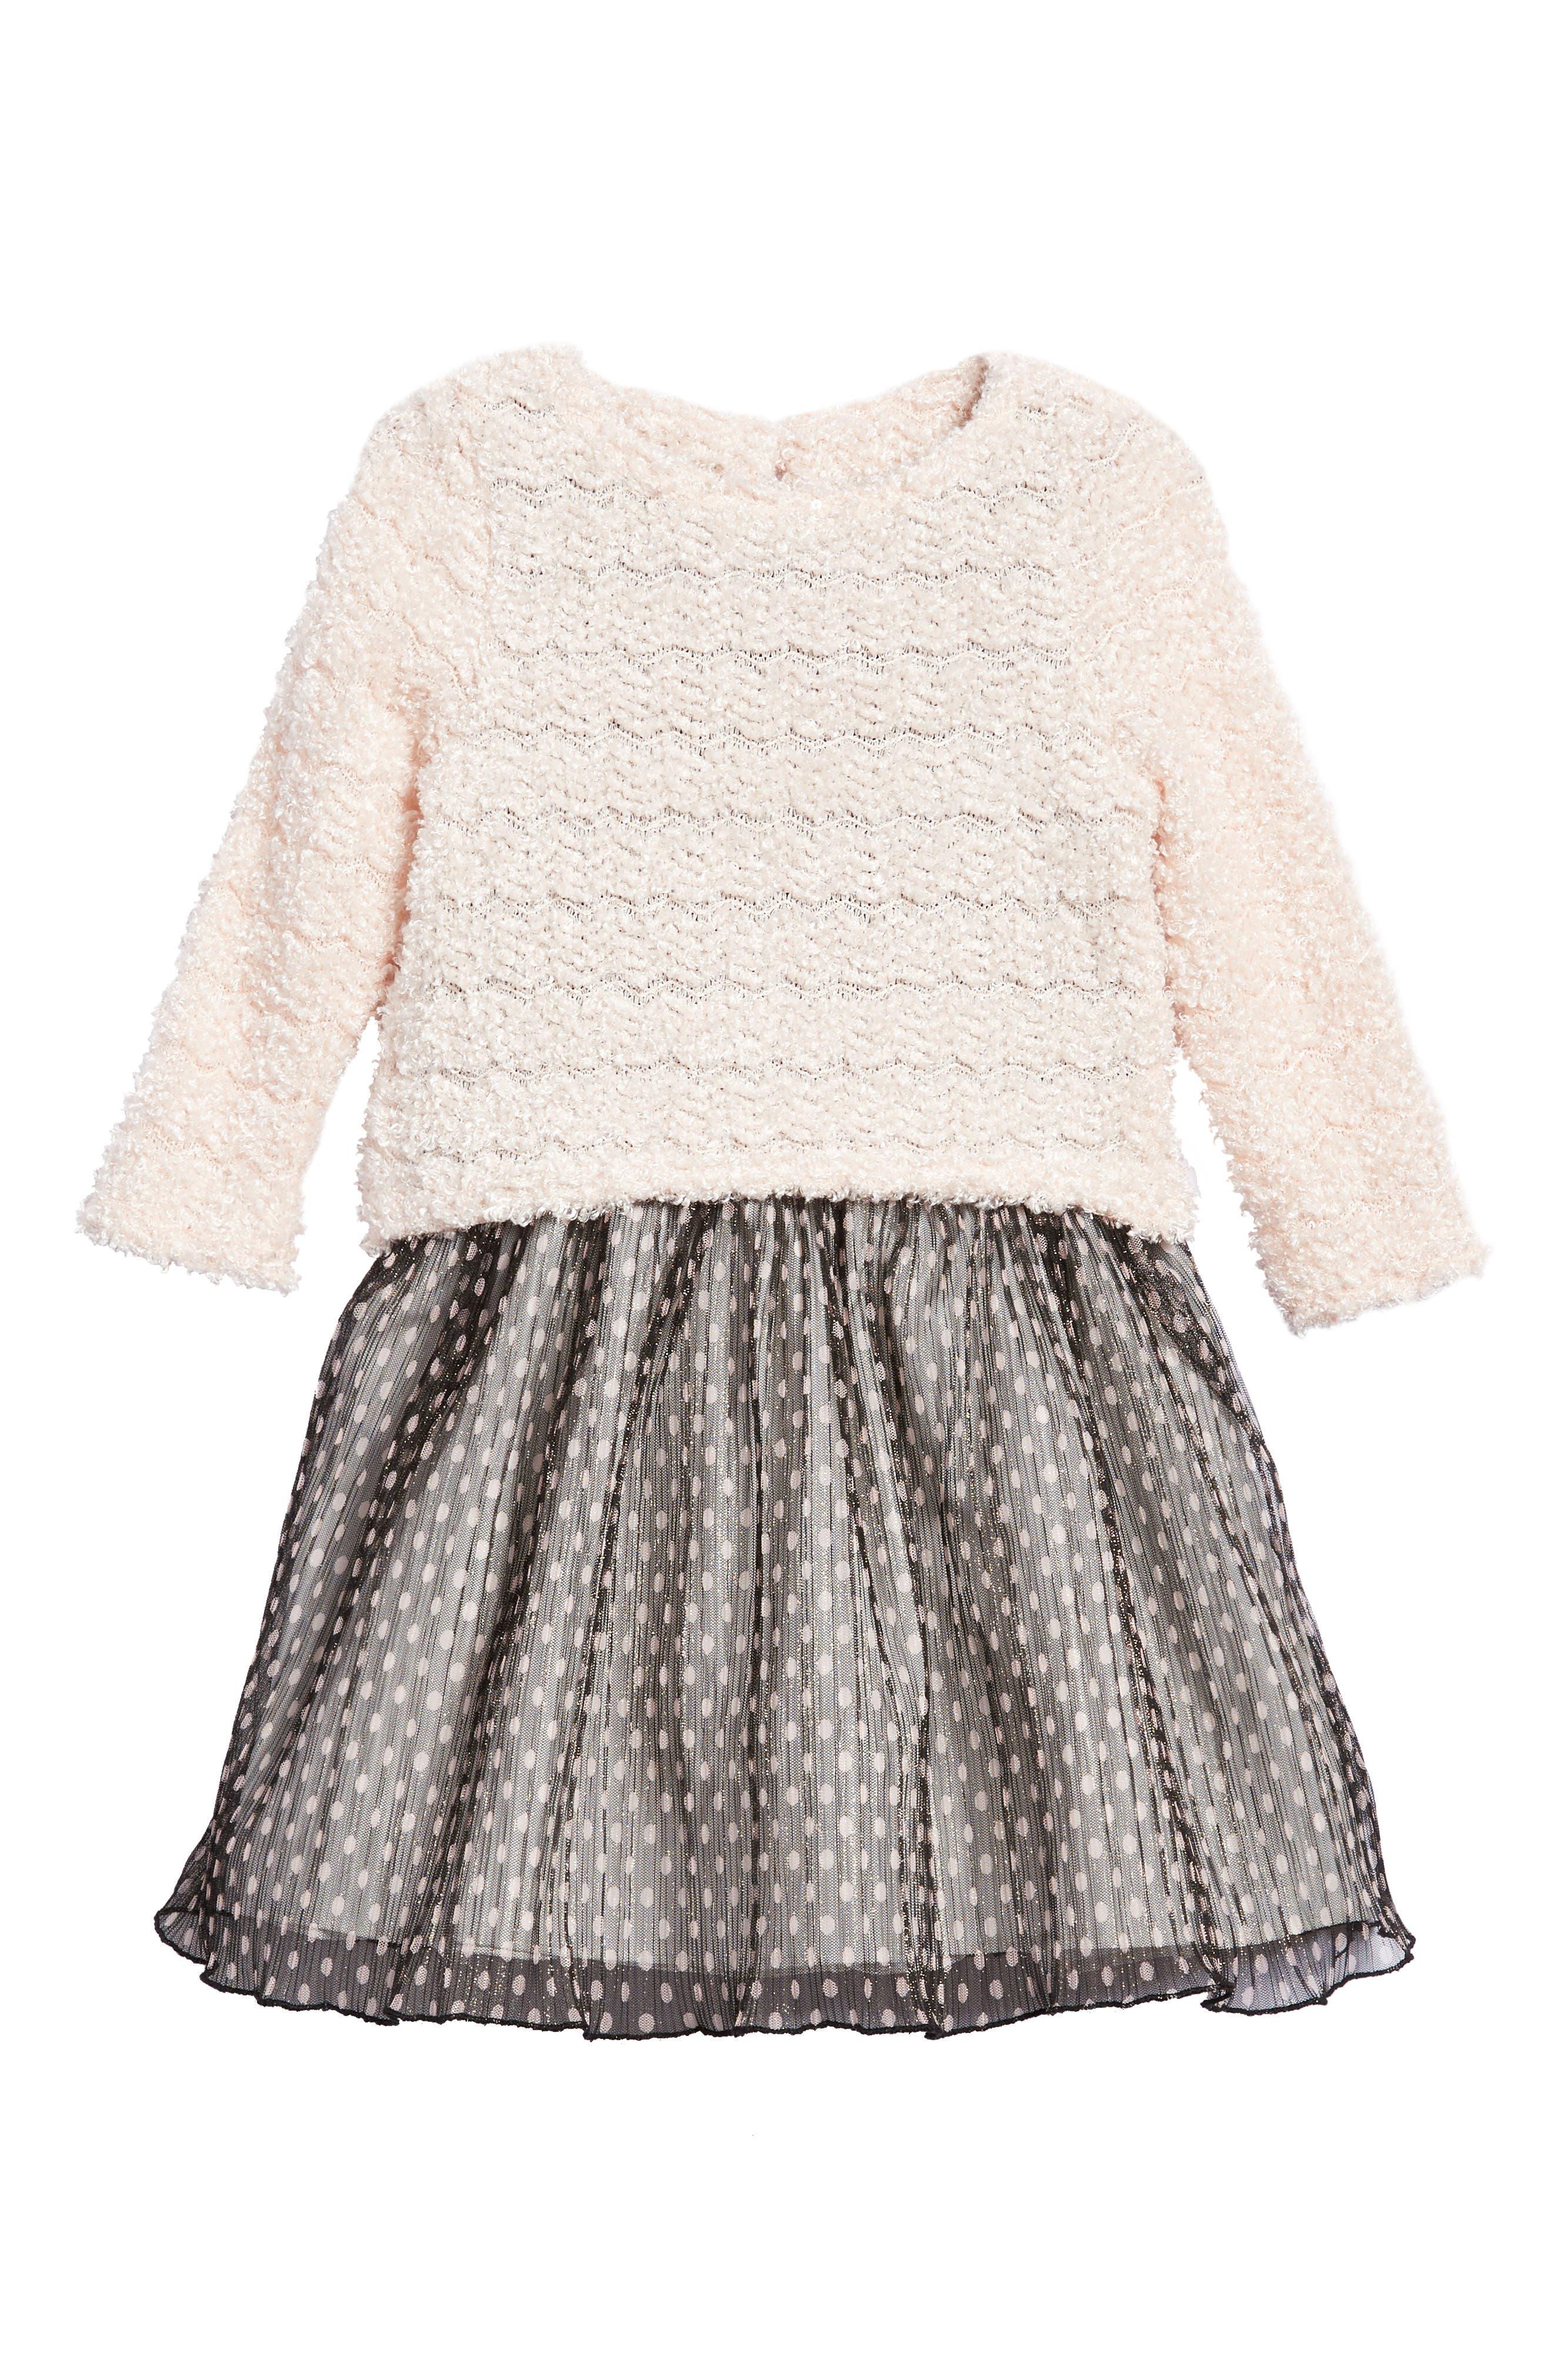 Main Image - Pippa & Julie Sweater & Dress Set (Toddler Girls & Little Girls)